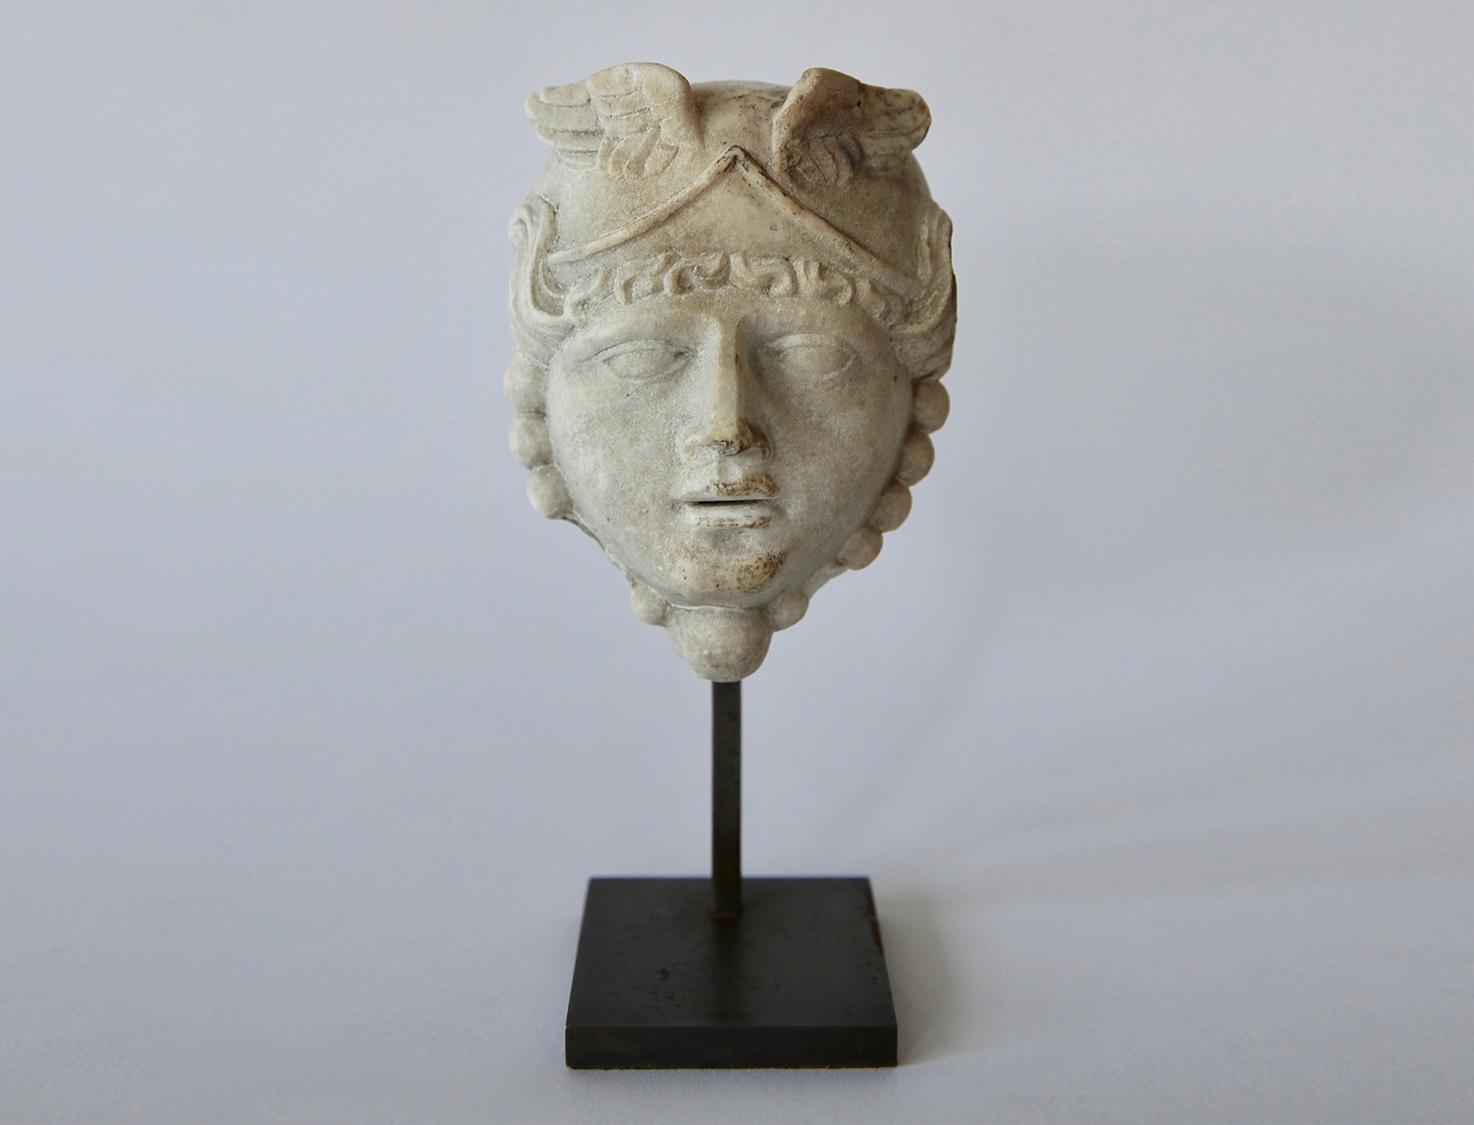 Small Empire 19th Century Medusa Head